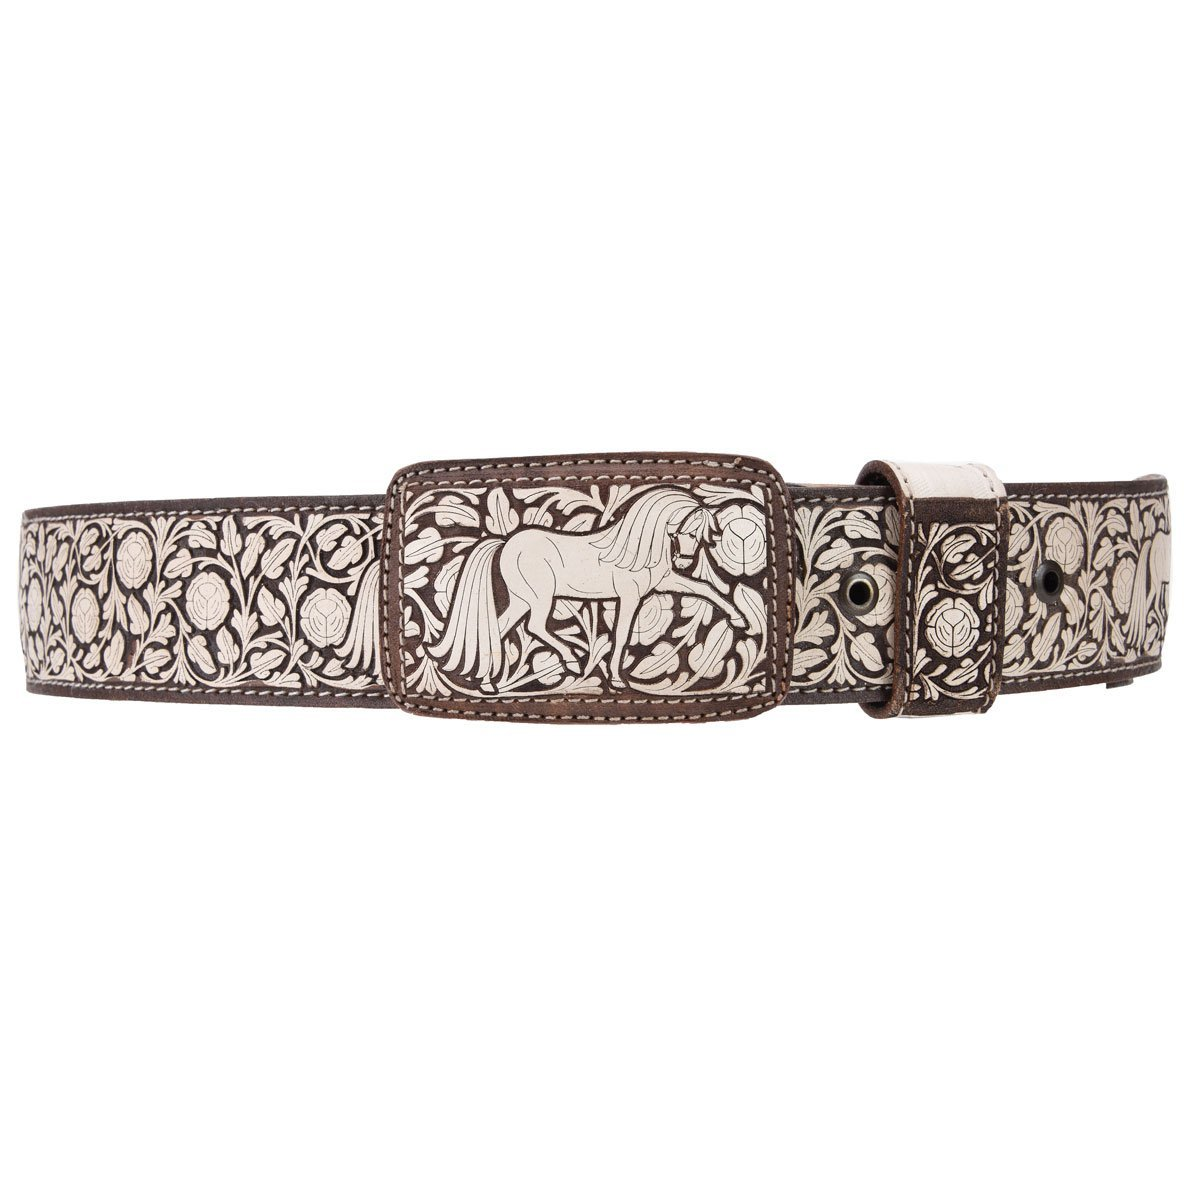 Laser Cut WD-1386 Wide Cowboy Style Belt